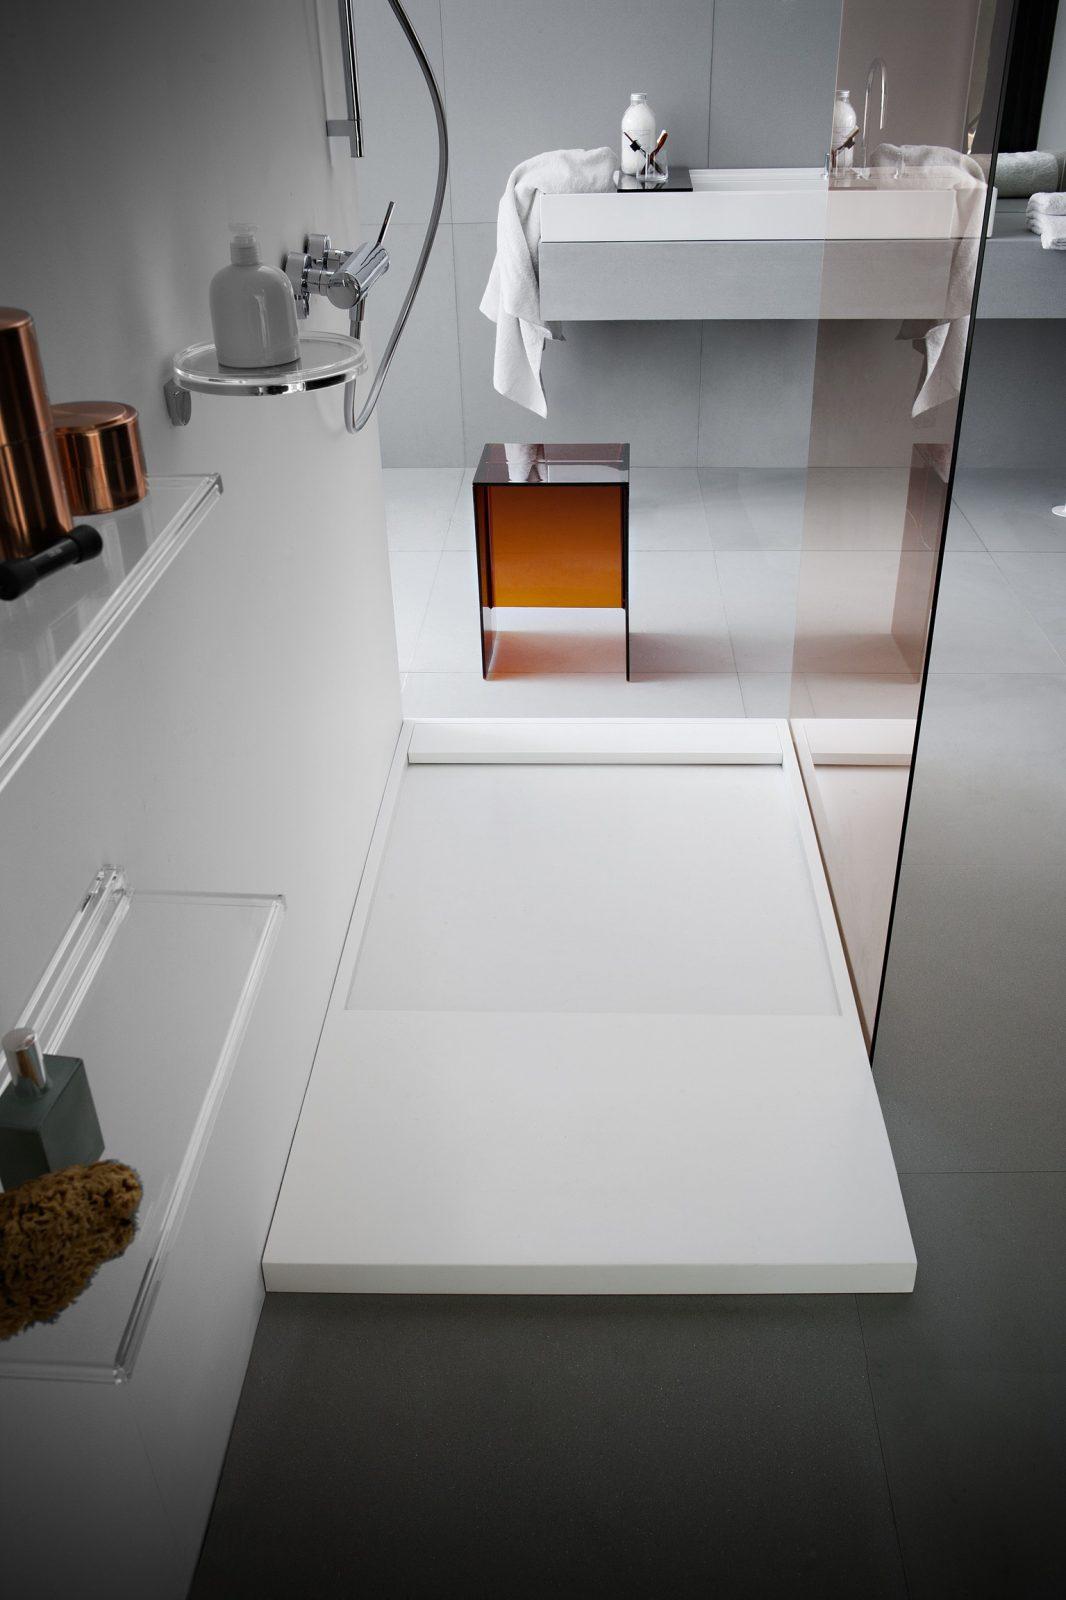 Meuble Salle De Bain Kartell ~ receveur de douche poser pour salle de bains kartell by laufen